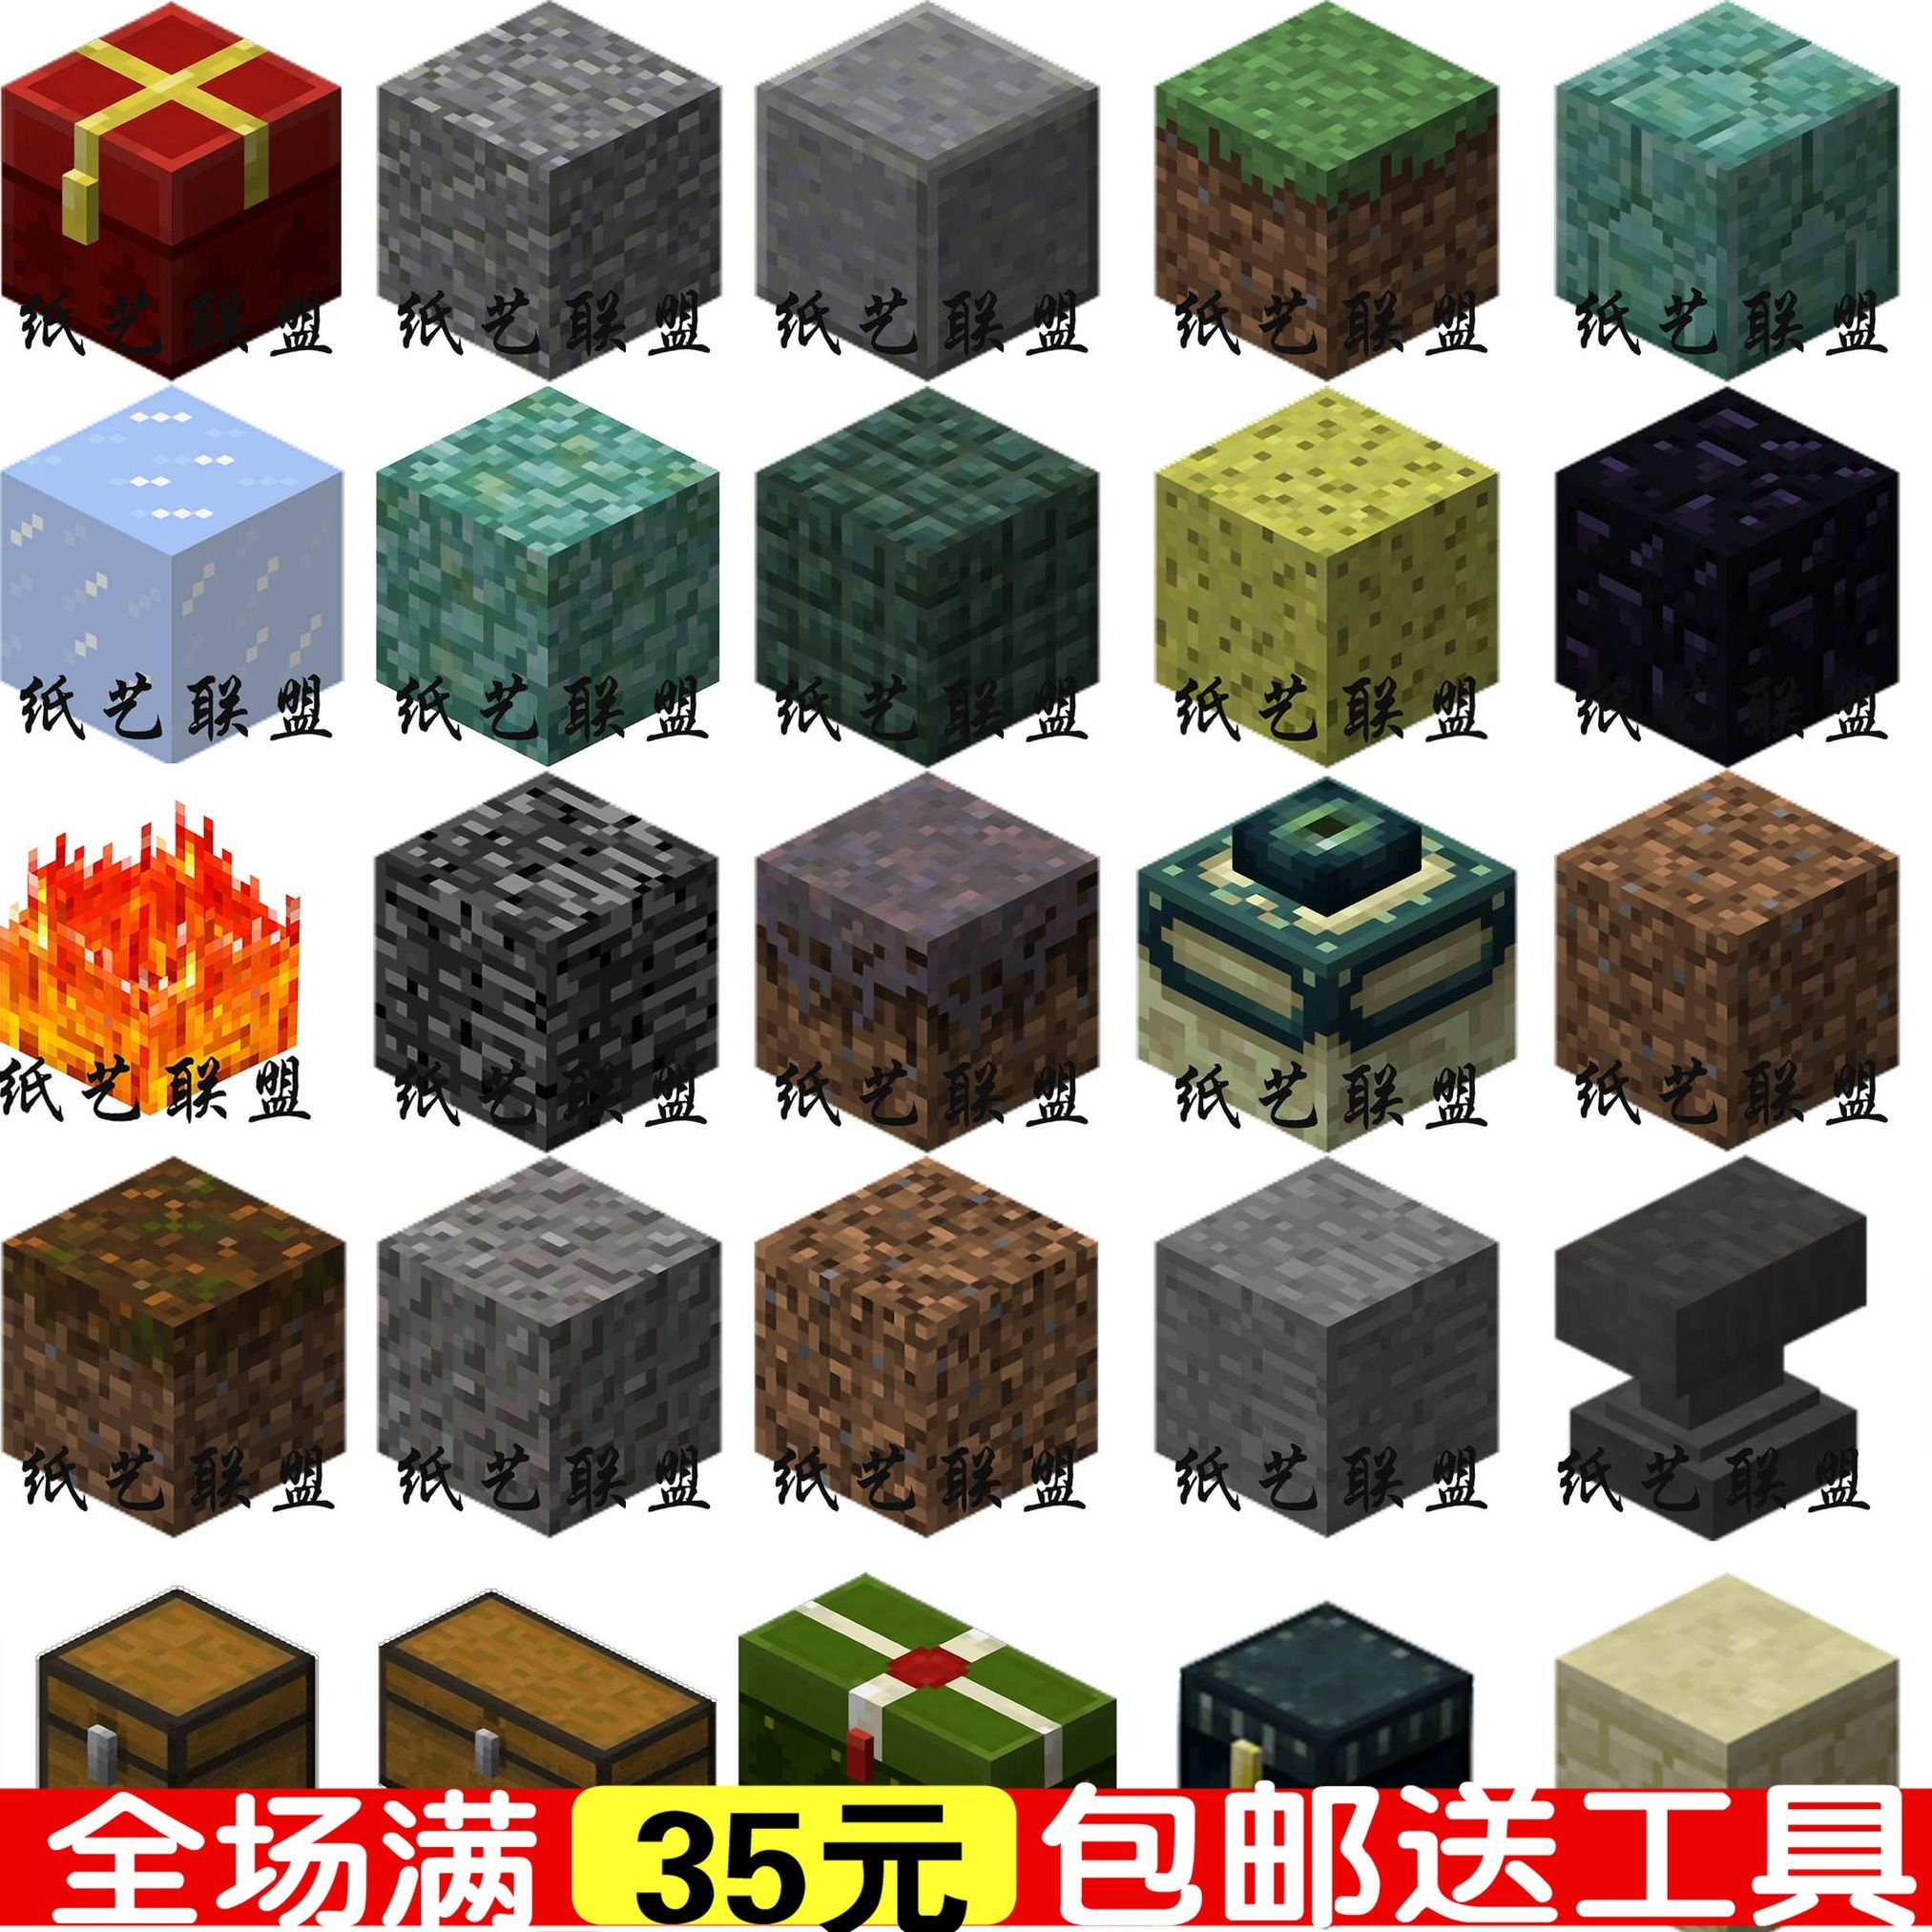 Minecraft我的世界周边玩具纸模型方块大全手工制作 6*6*6厘米 ④